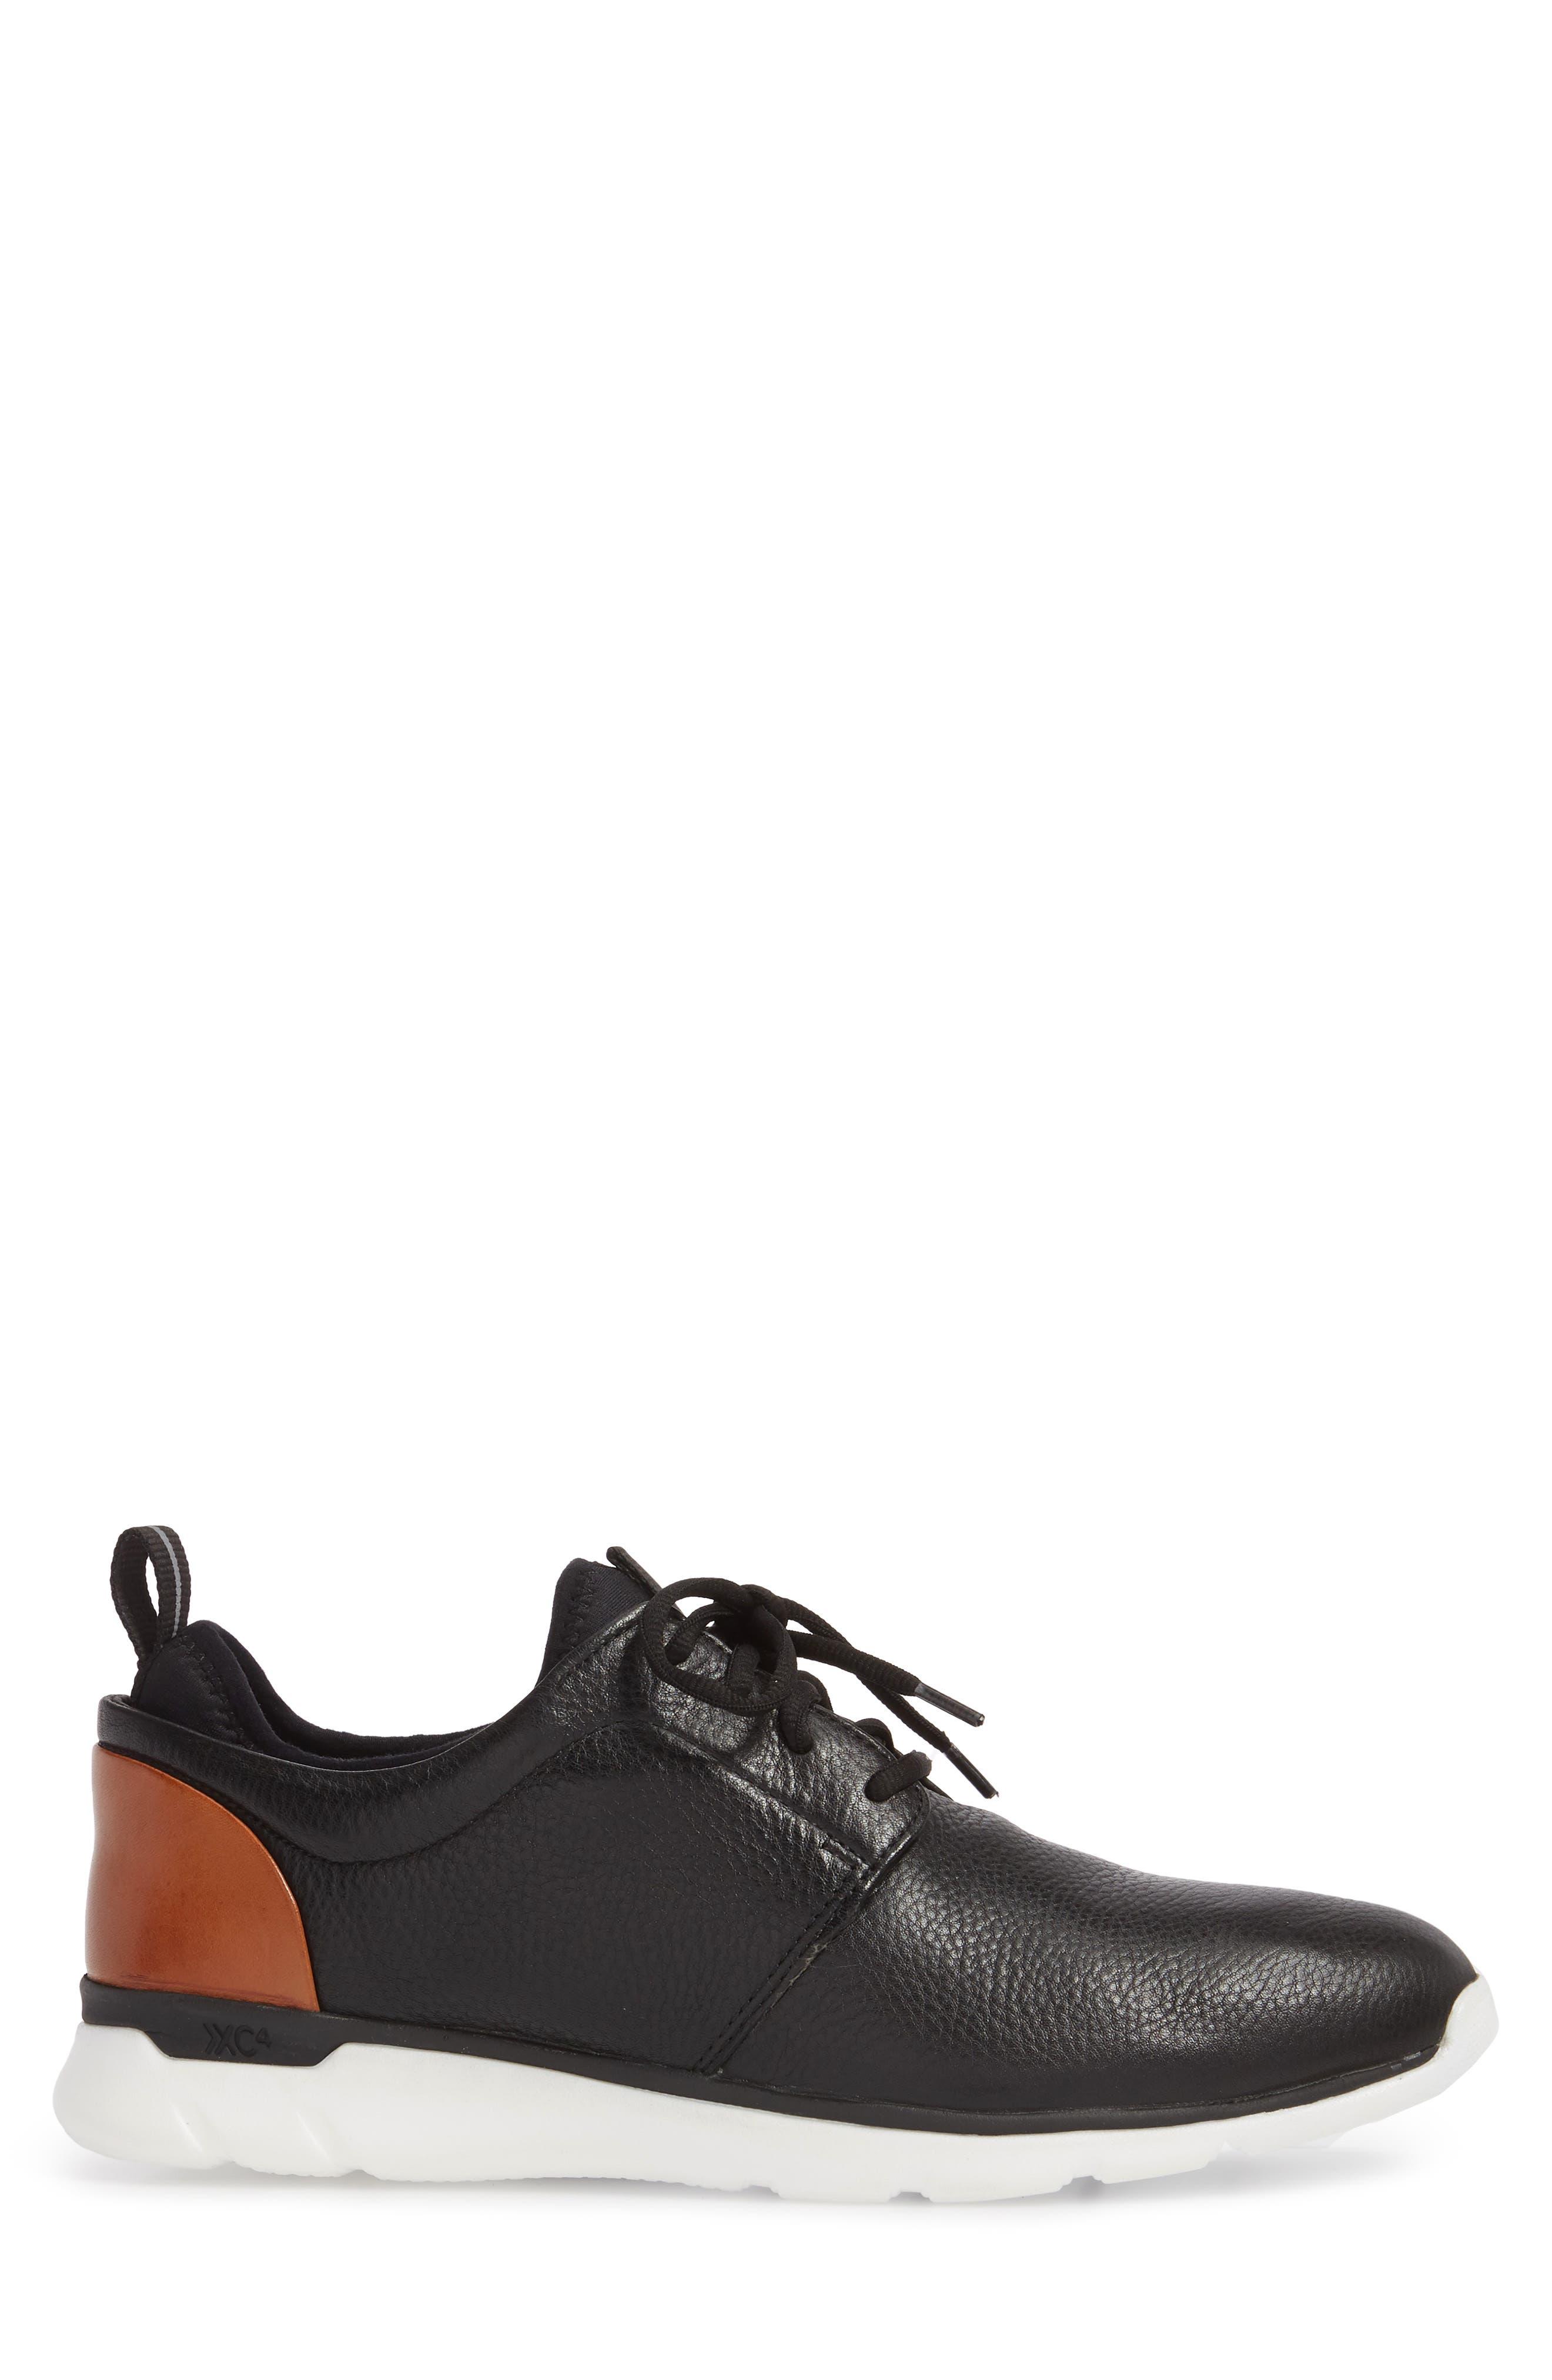 Alternate Image 3  - Johnston & Murphy Prentiss XC4® Waterproof Low Top Sneaker (Men)